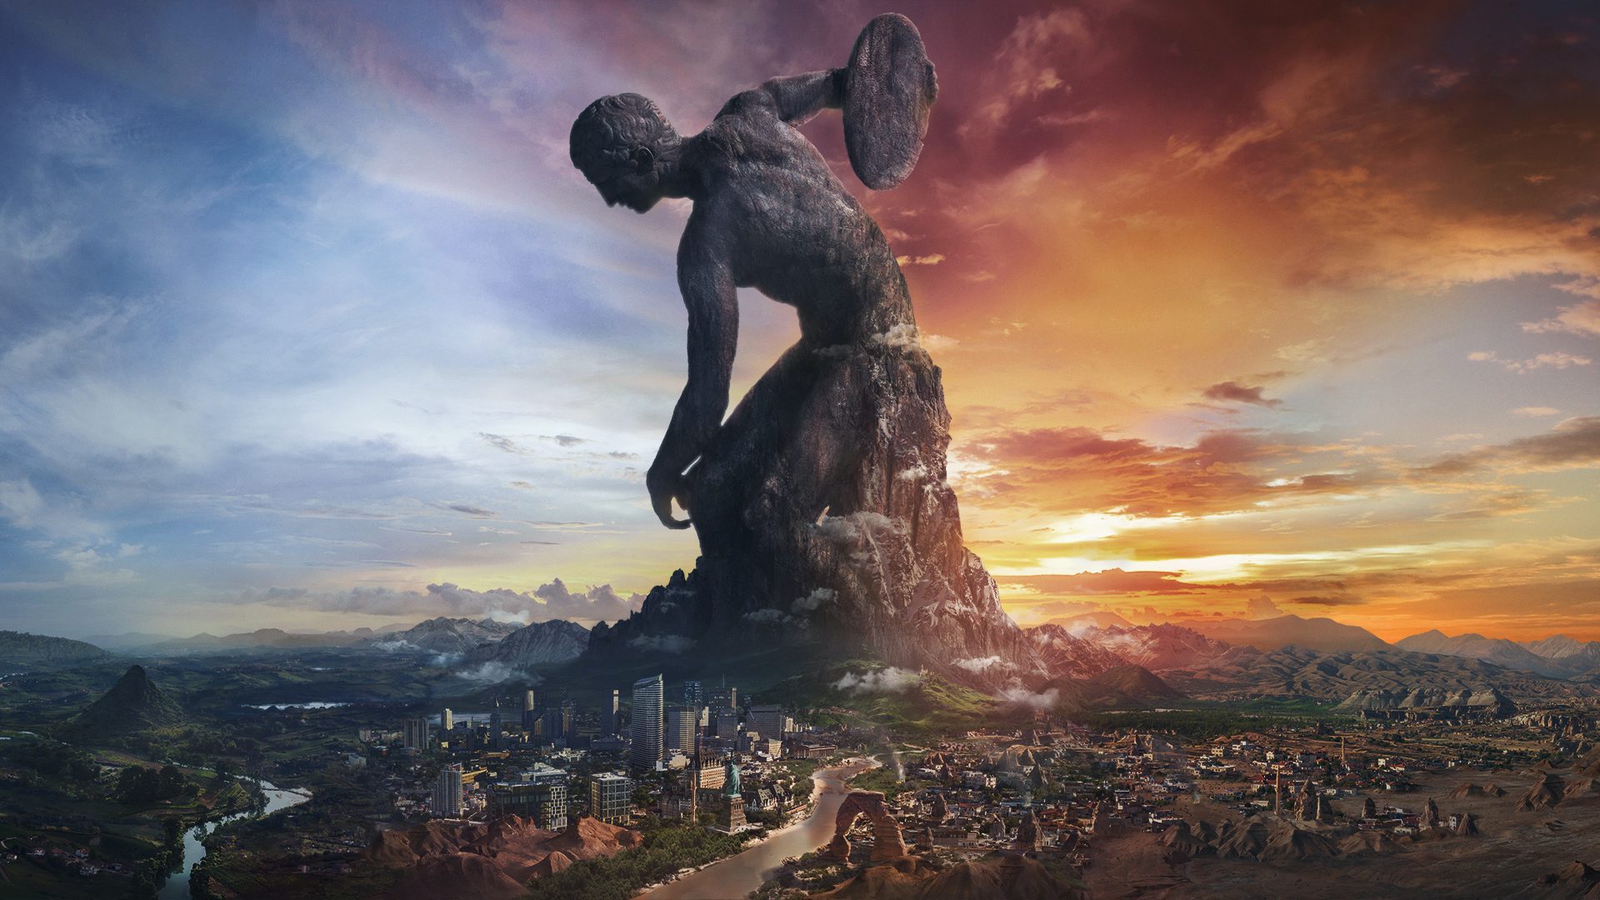 Sid Meier's Civilization VI: Rise and Fall Review - Civ VI Rises Again